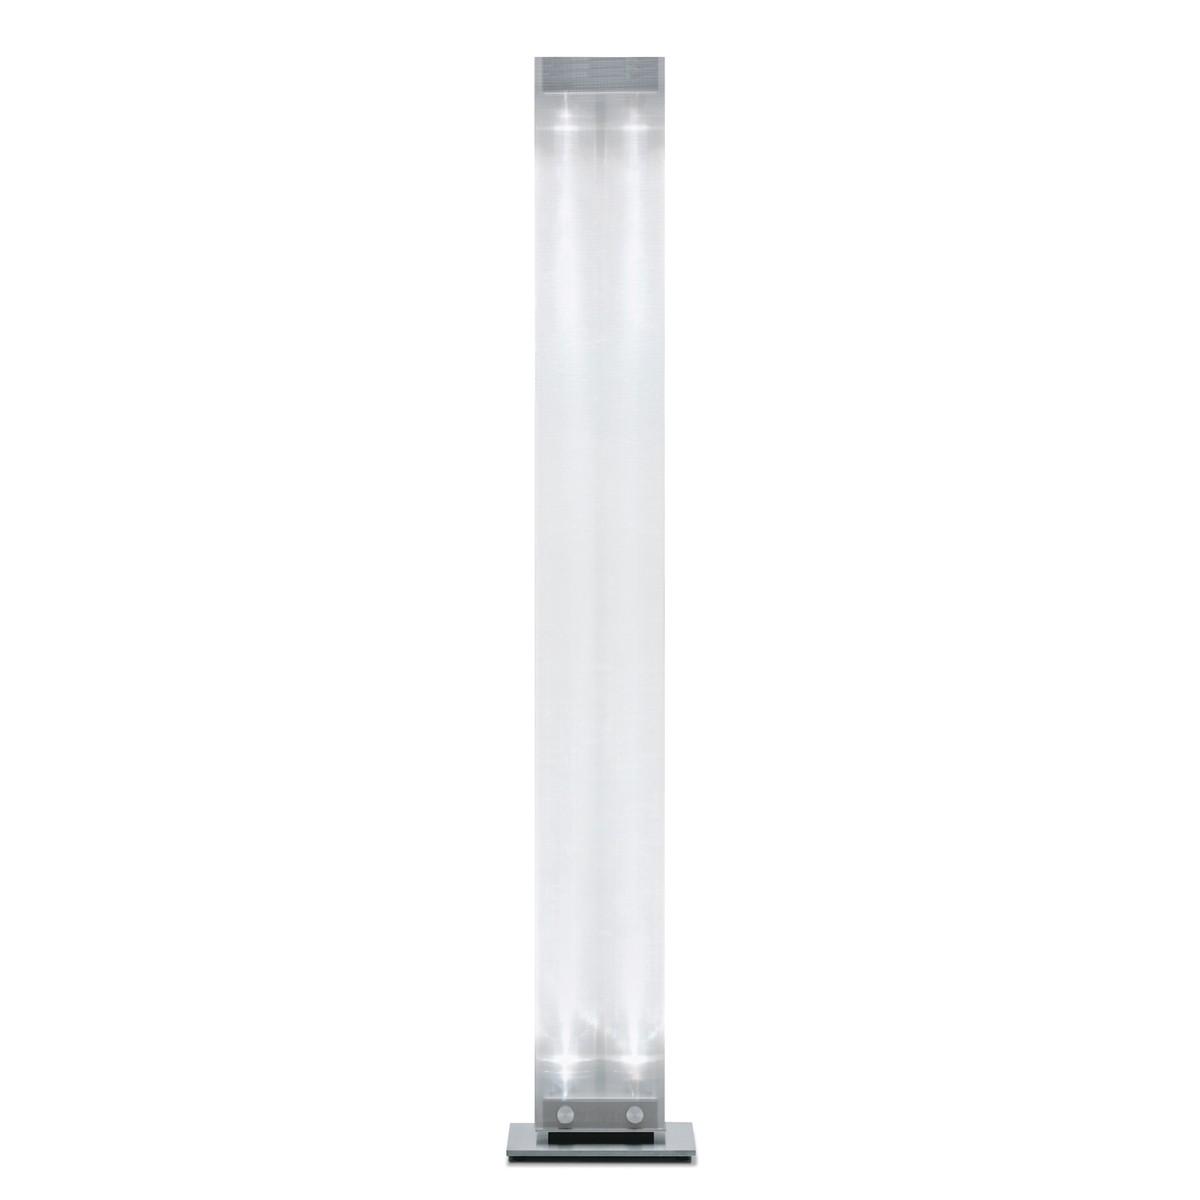 Belux Twilight-10 Stehleuchte LED, mit Dimmer, Chromstahl/Acrylglas